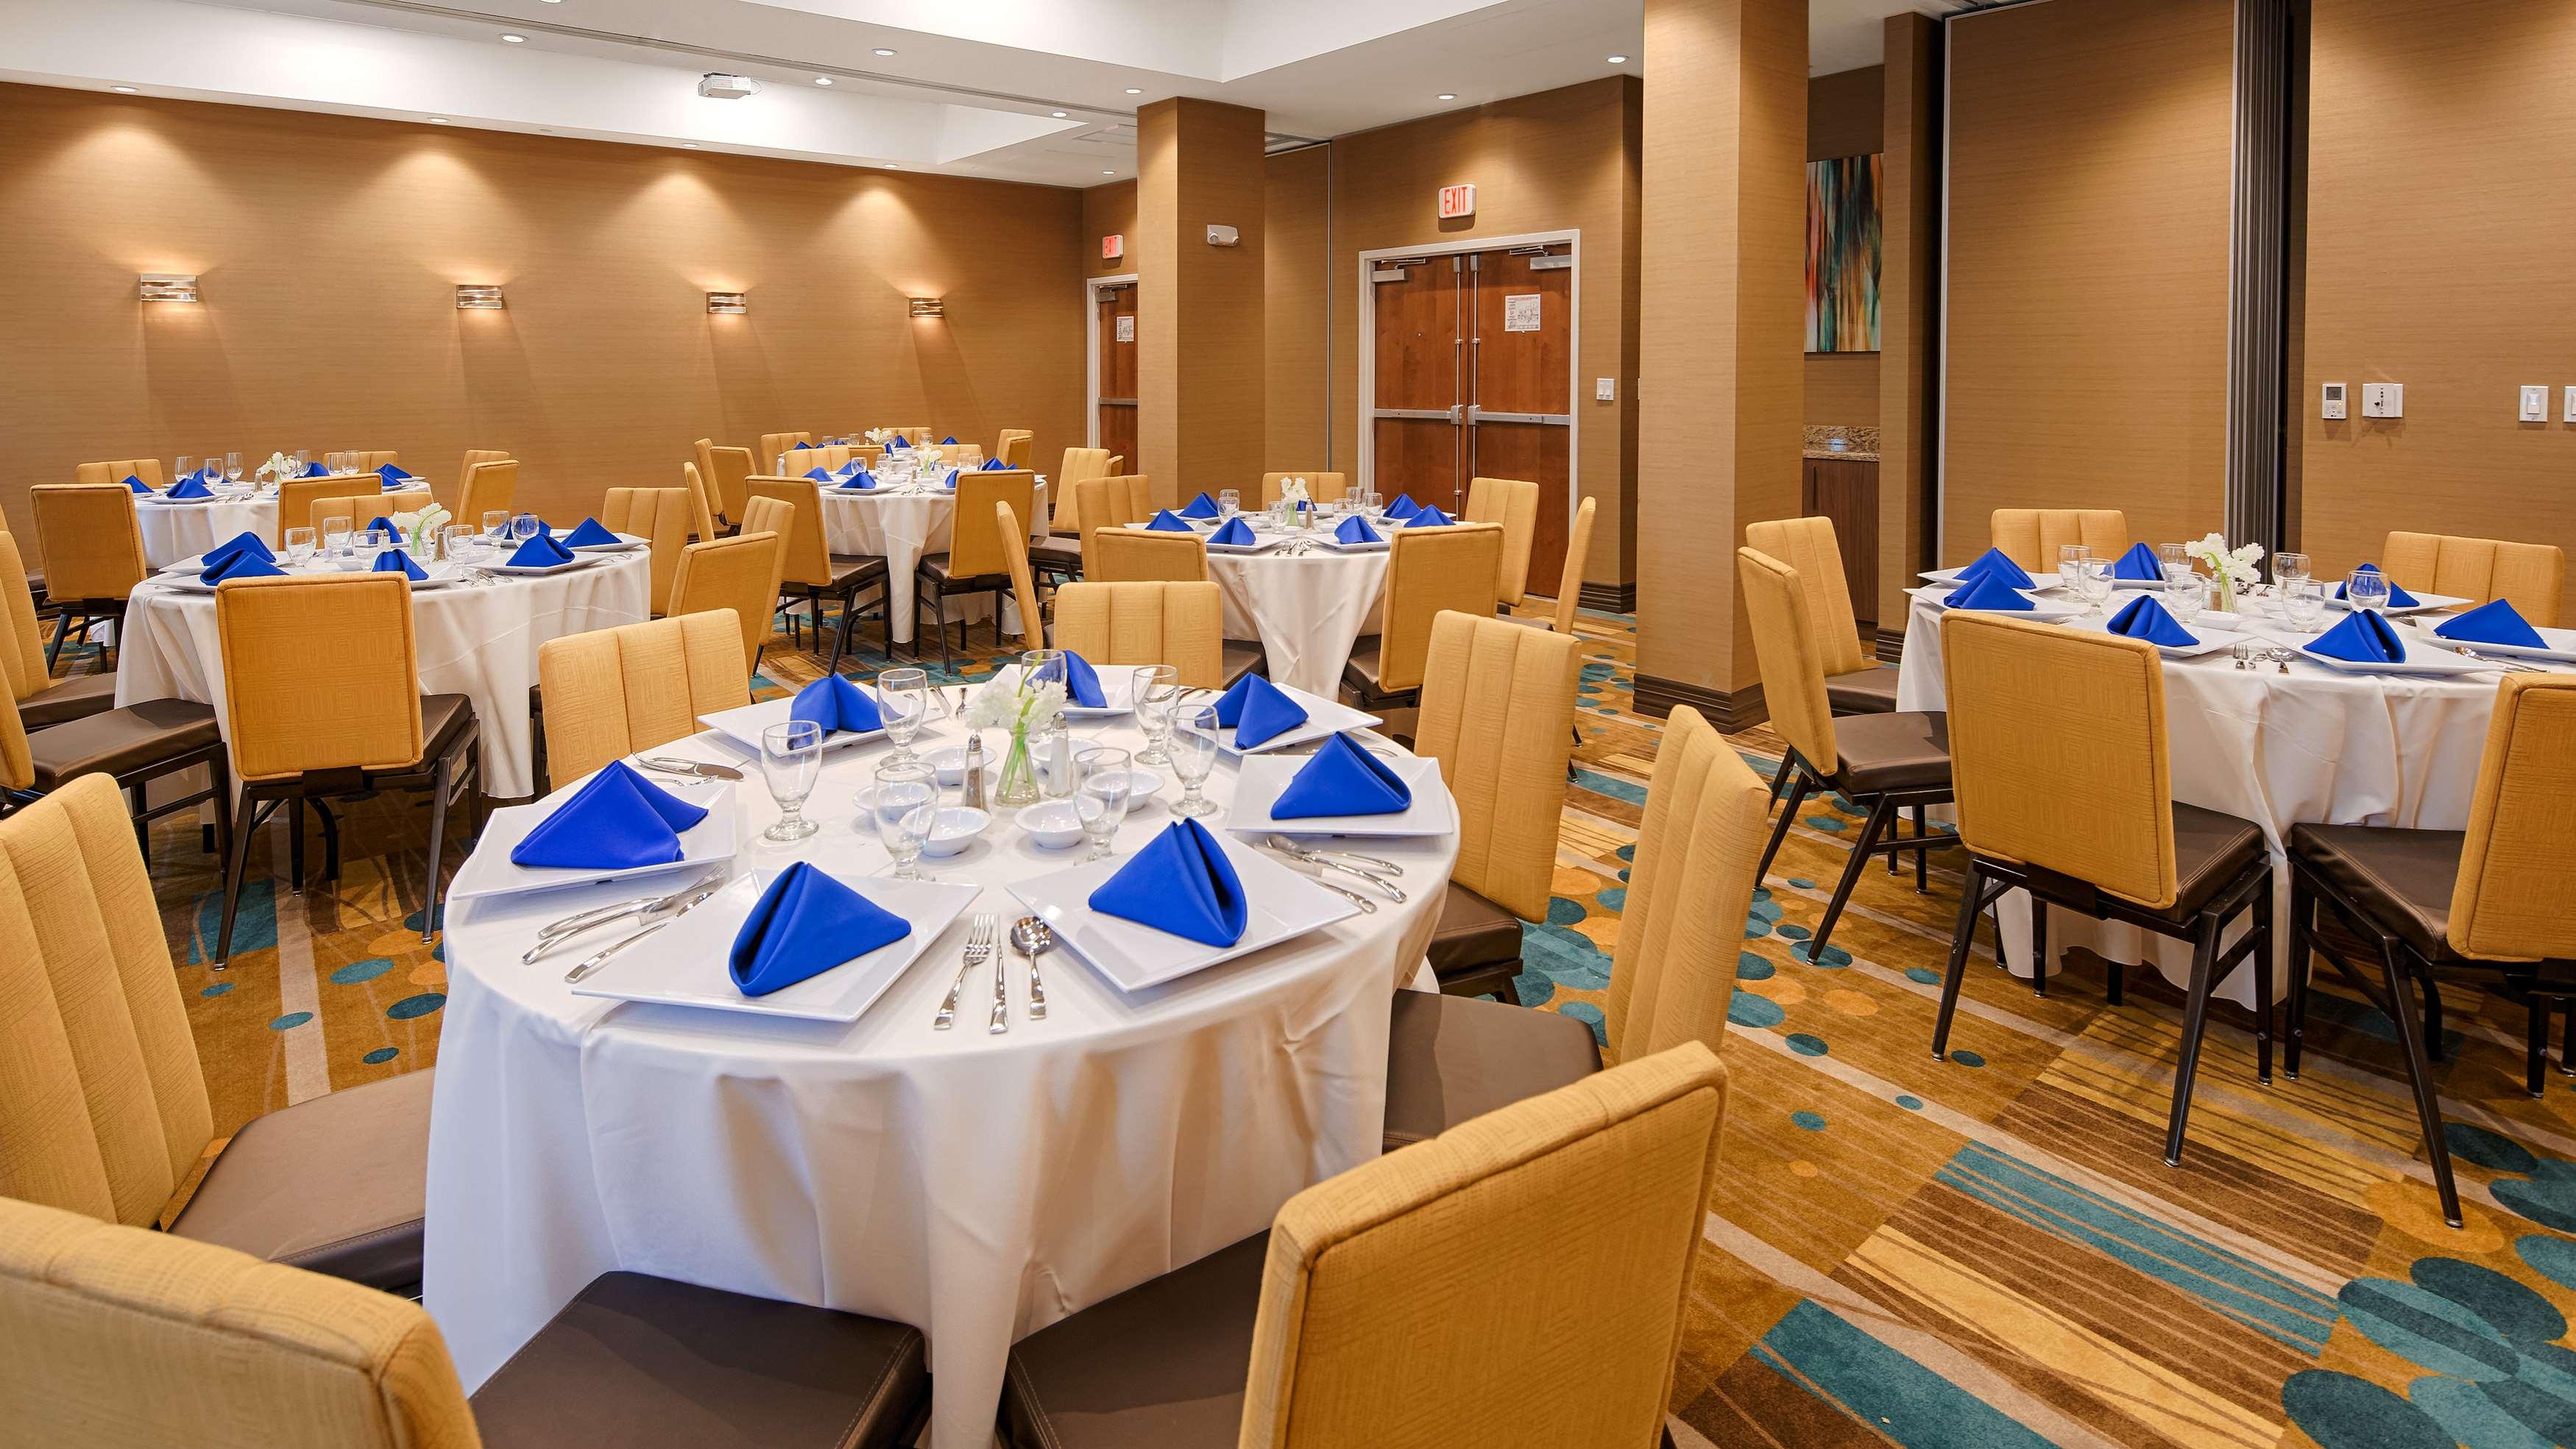 Best Western Plus Kendall Airport Hotel & Suites image 33